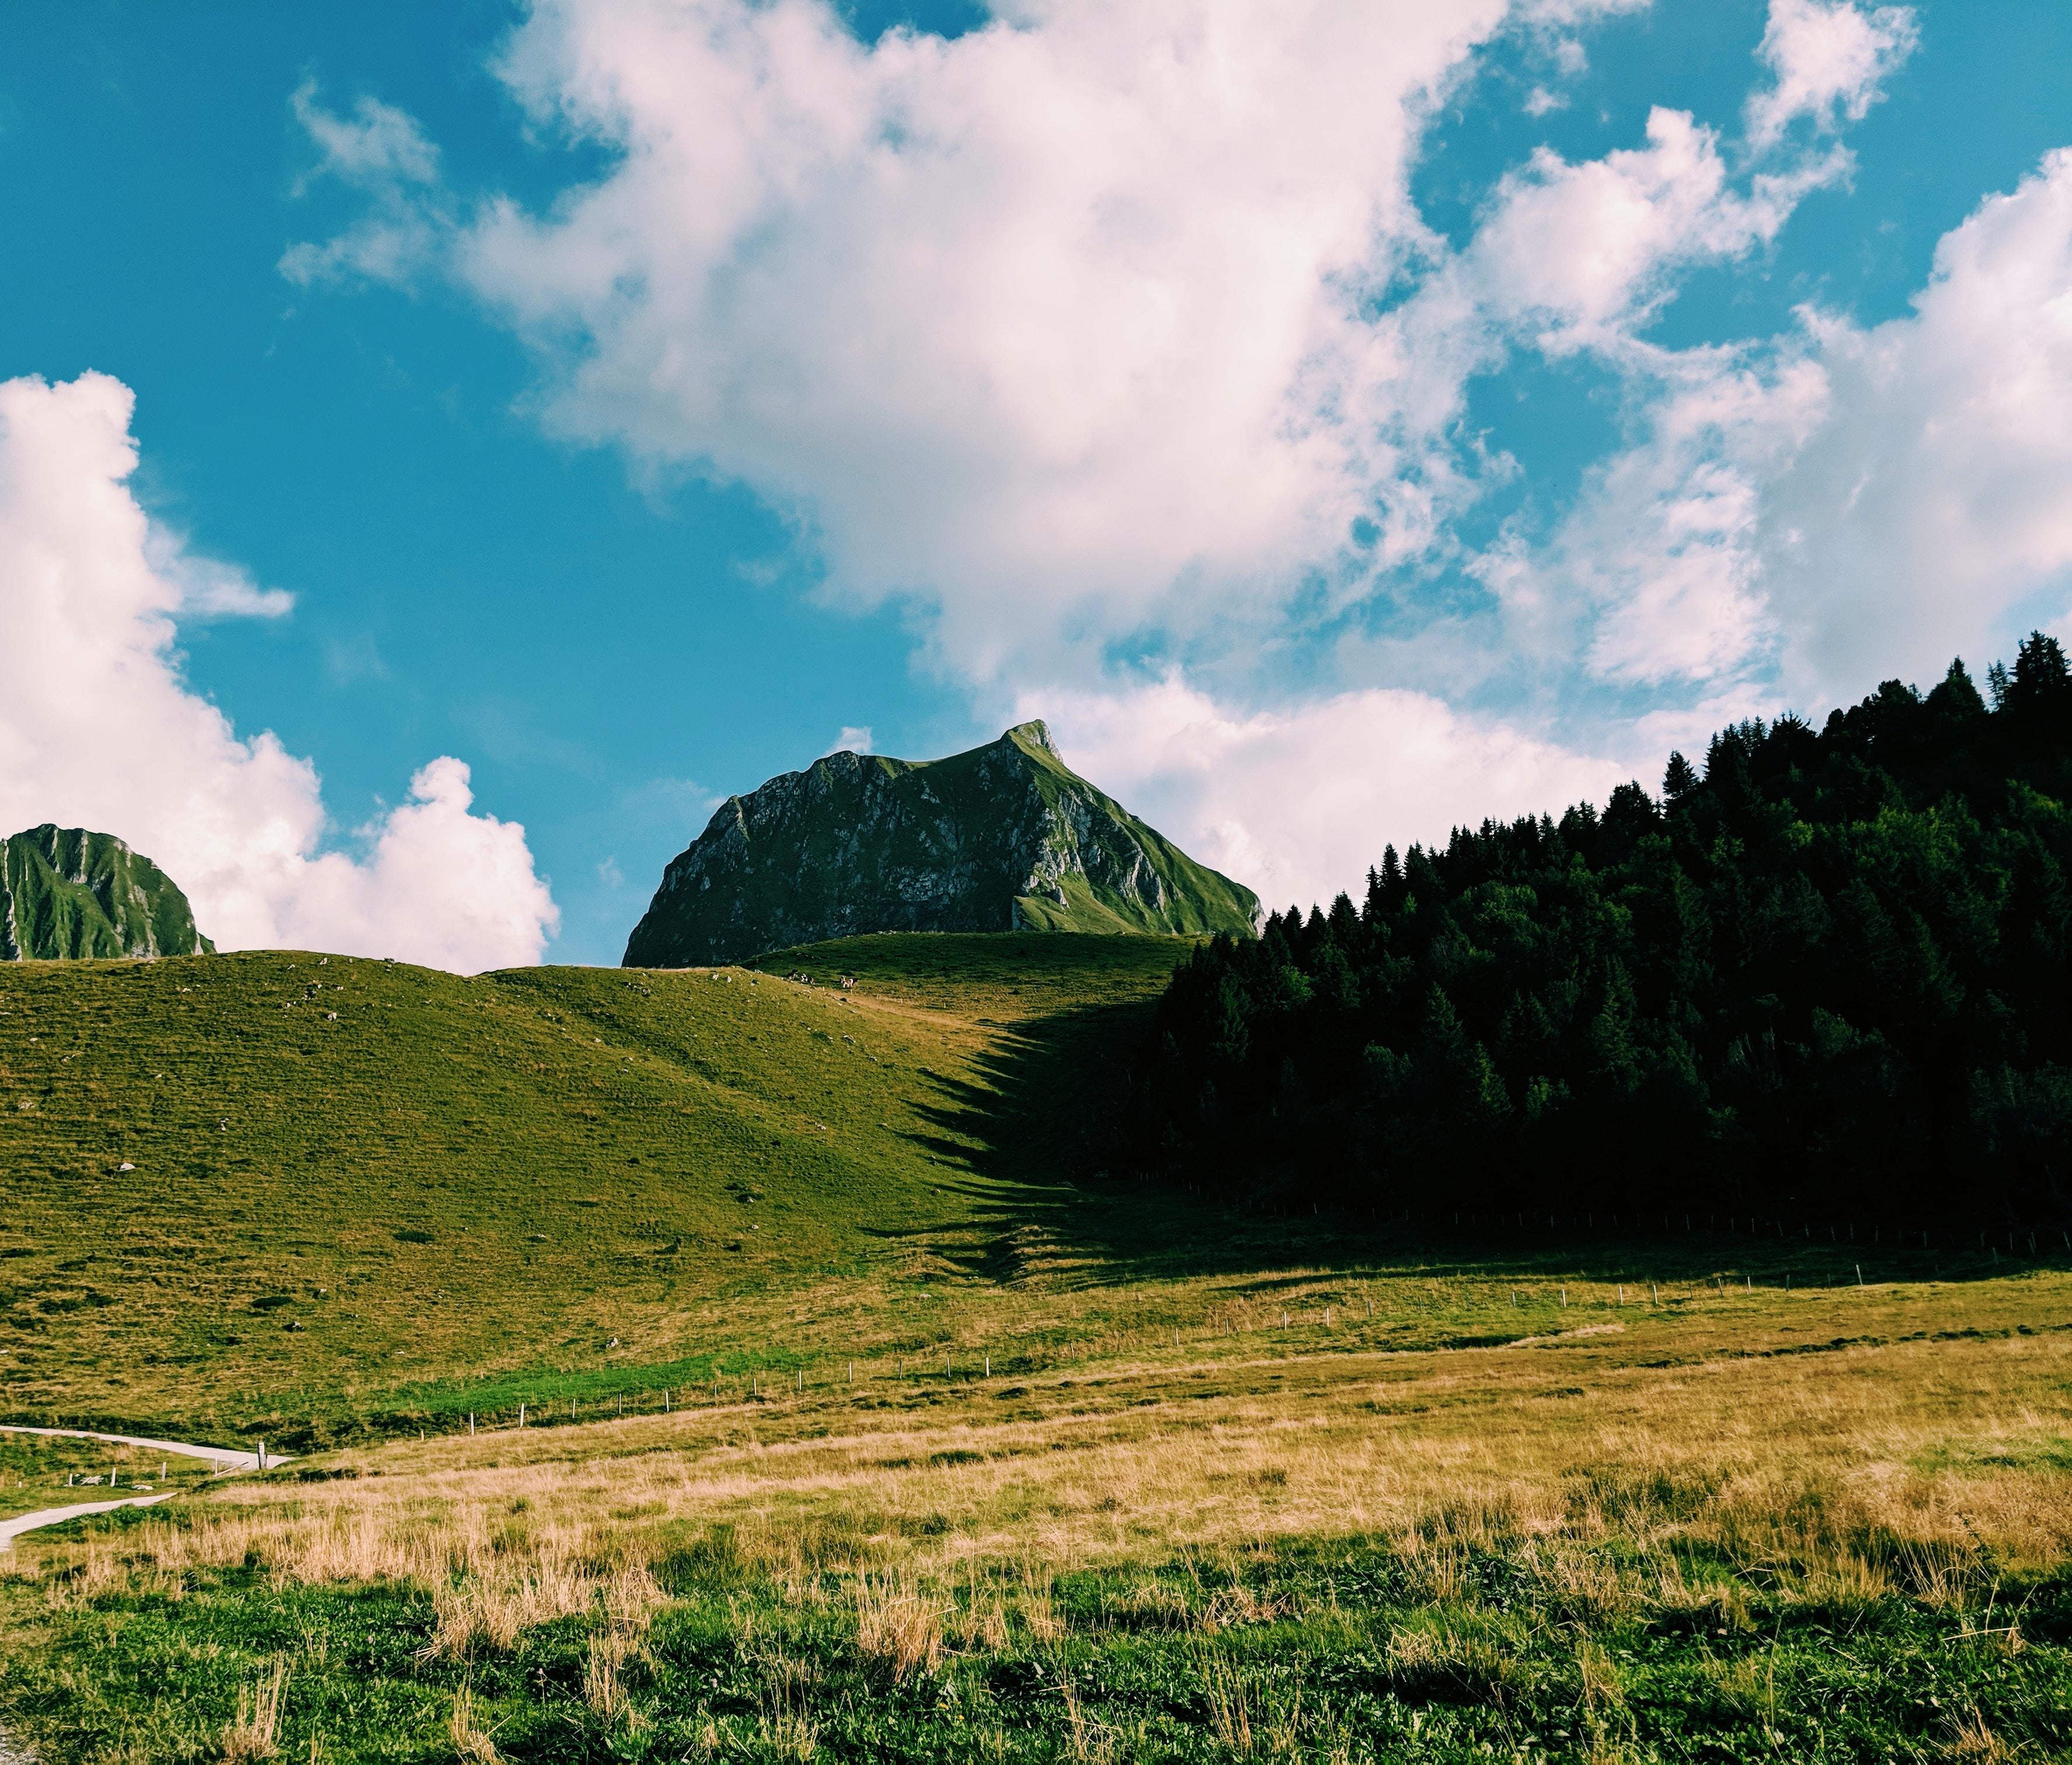 green grass mountain under blue sky during daytime